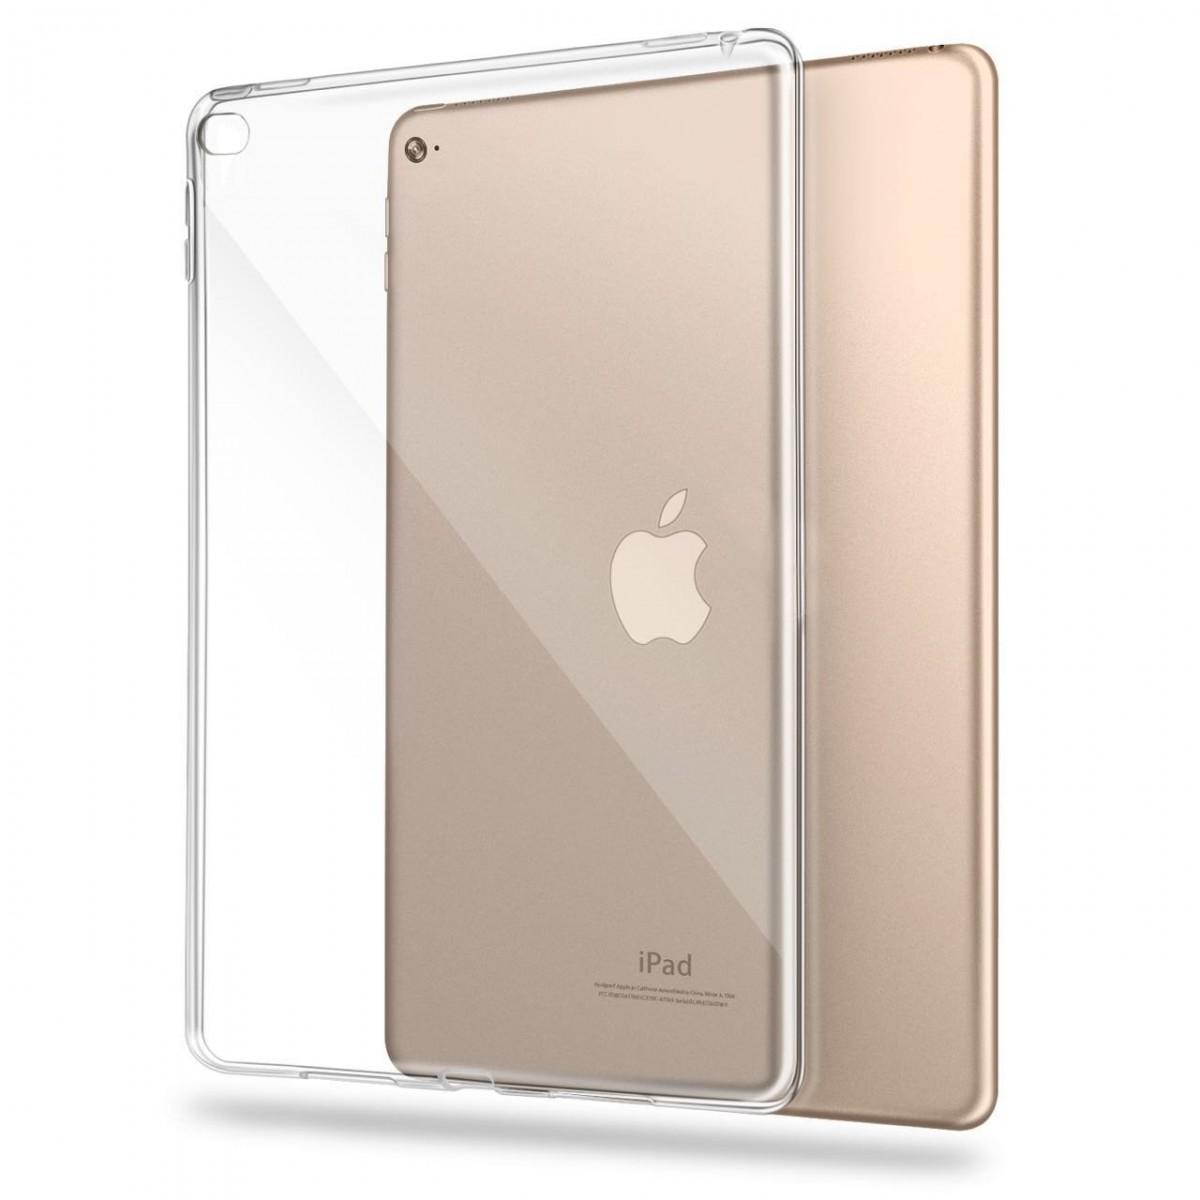 Silikonový průhledný obal / kryt pro Apple iPad Air 2 (čirý)